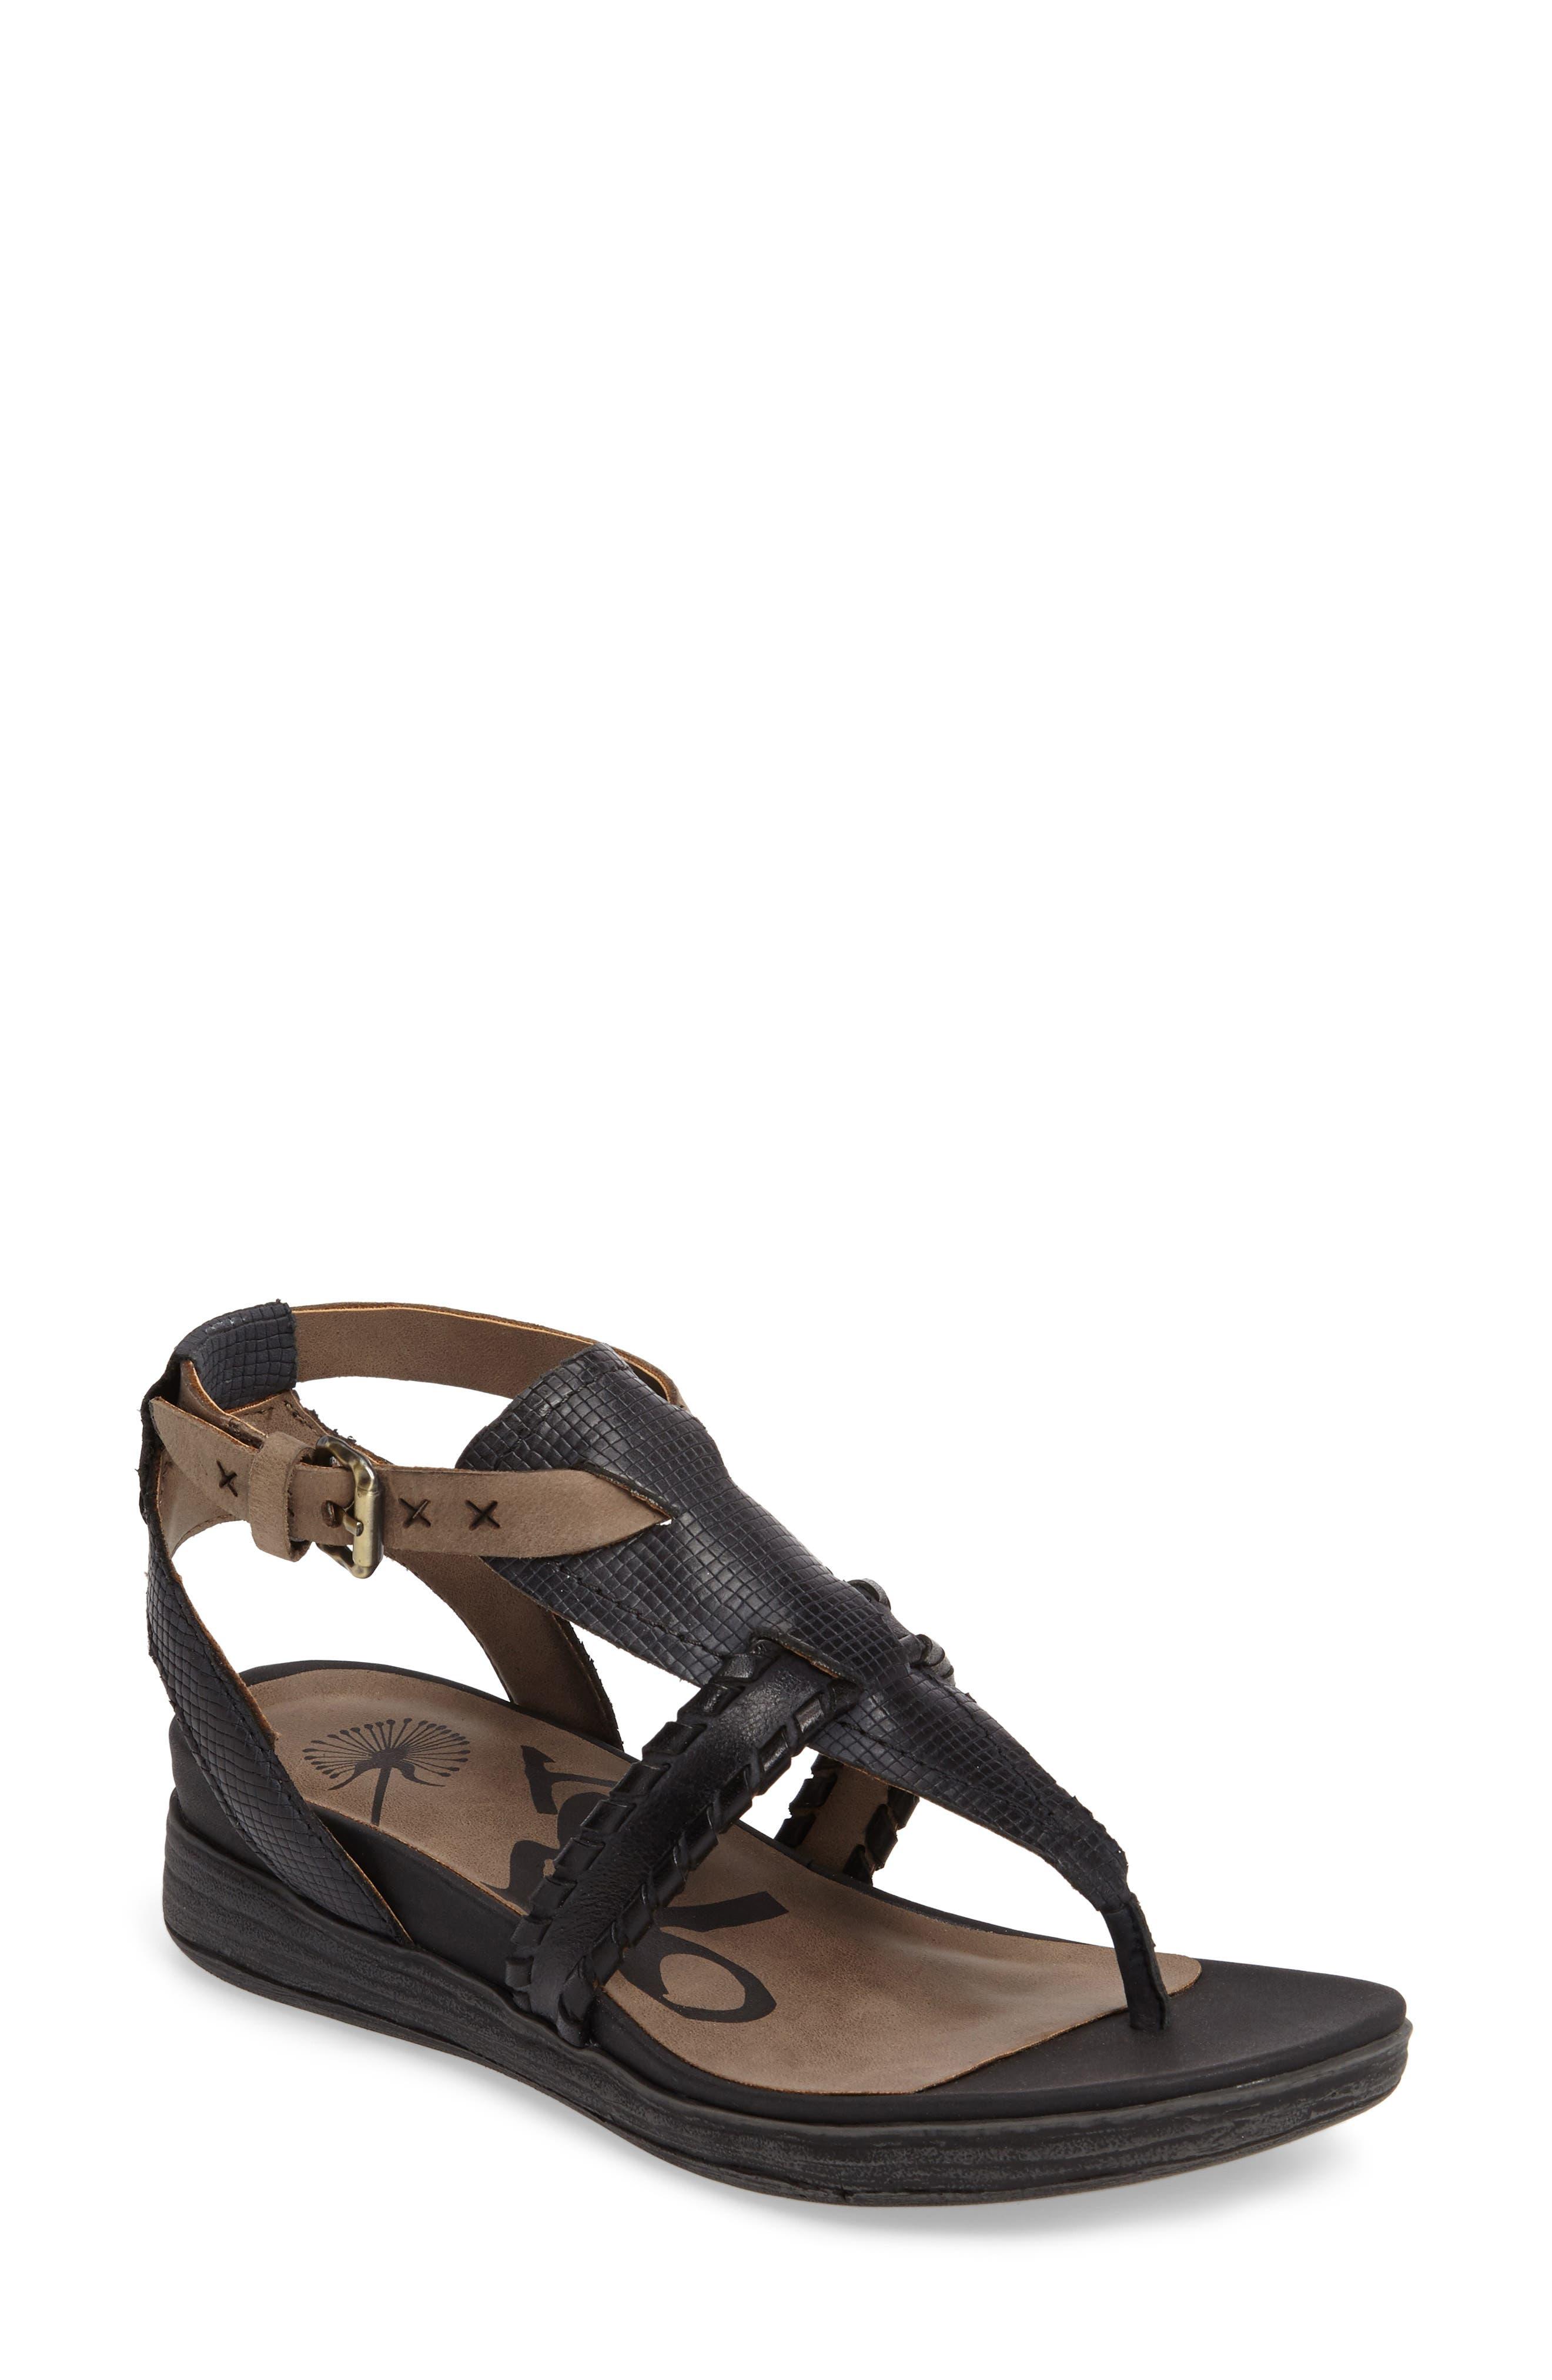 Celestial V-Strap Wedge Sandal,                         Main,                         color, 001